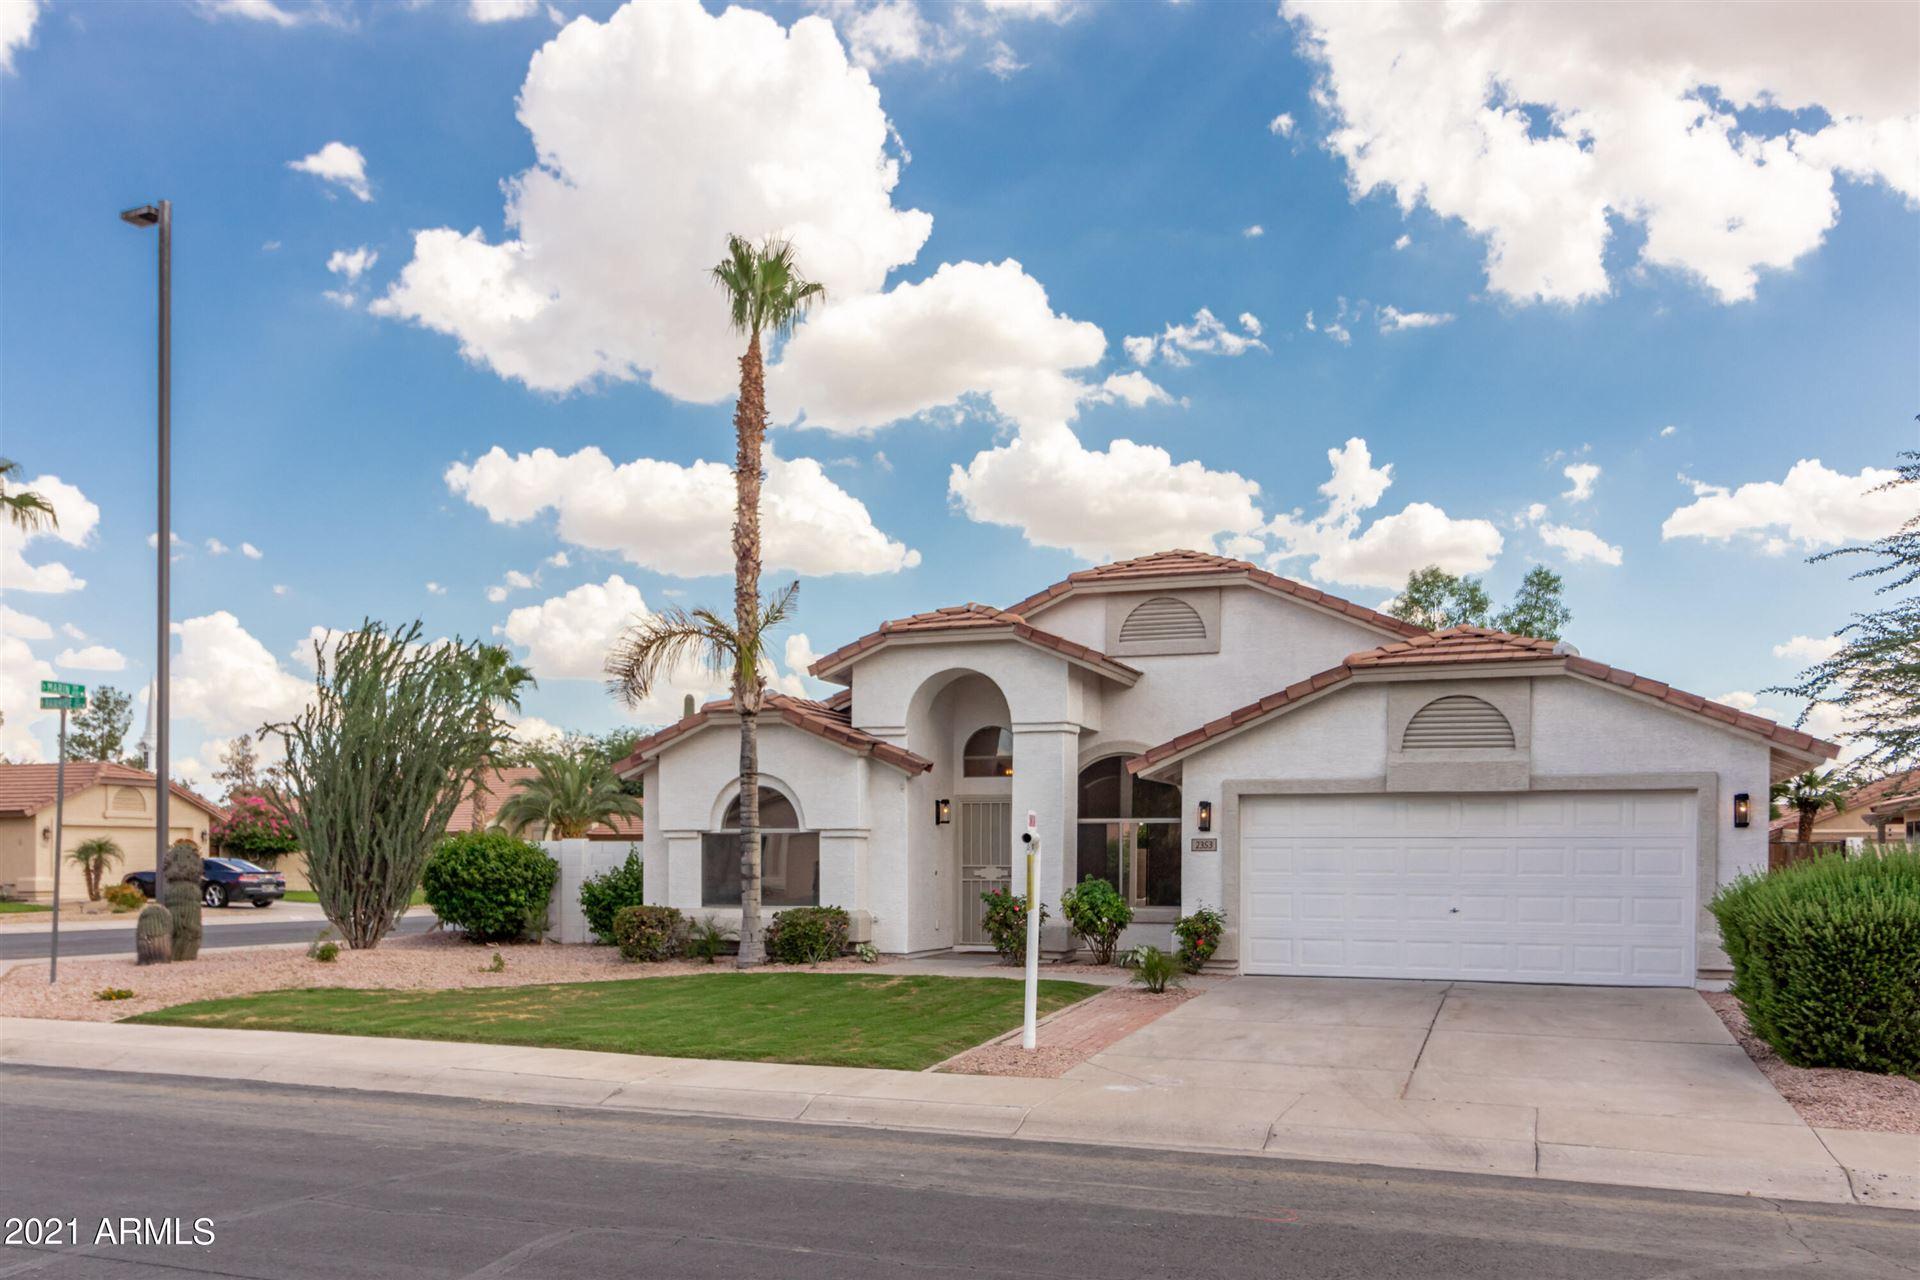 Photo of 2353 E RAWHIDE Street, Gilbert, AZ 85296 (MLS # 6261858)